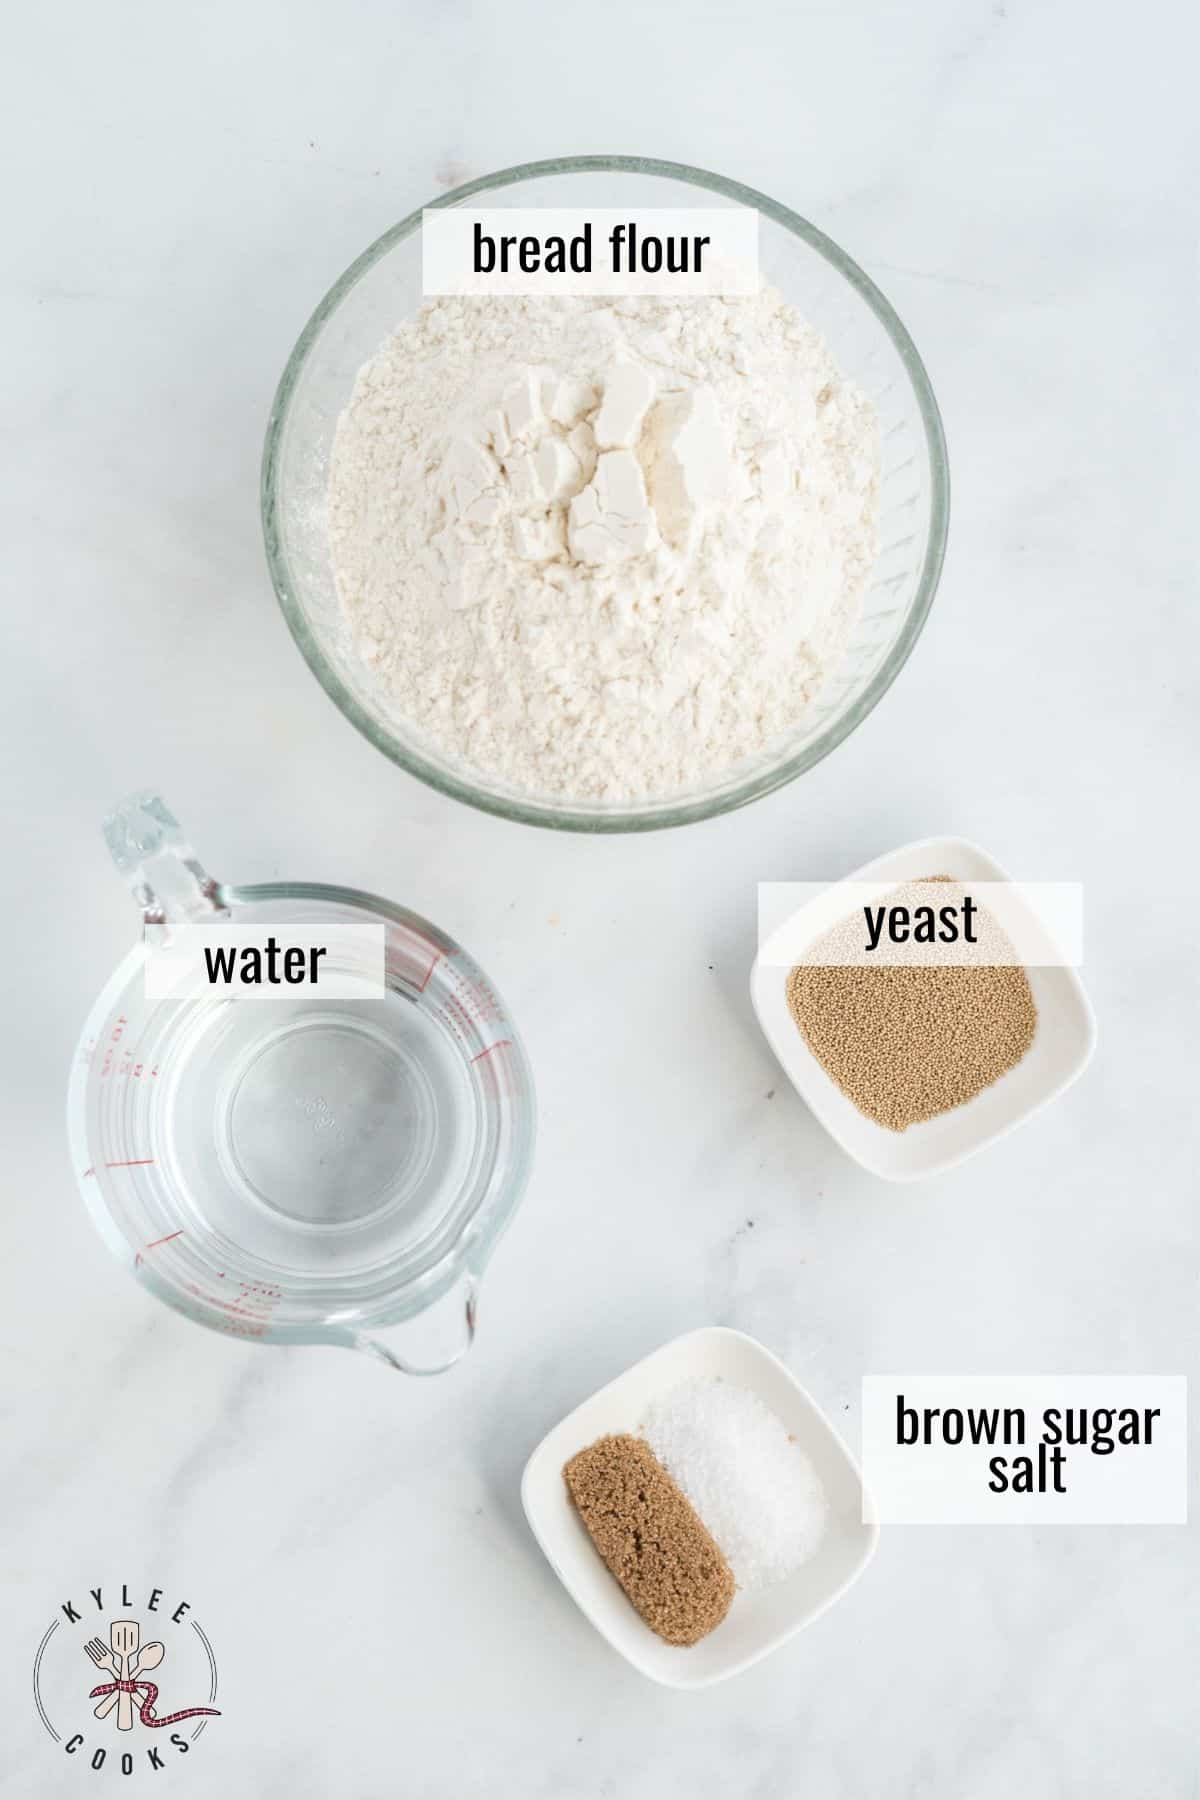 ingredients to make homemade bagels